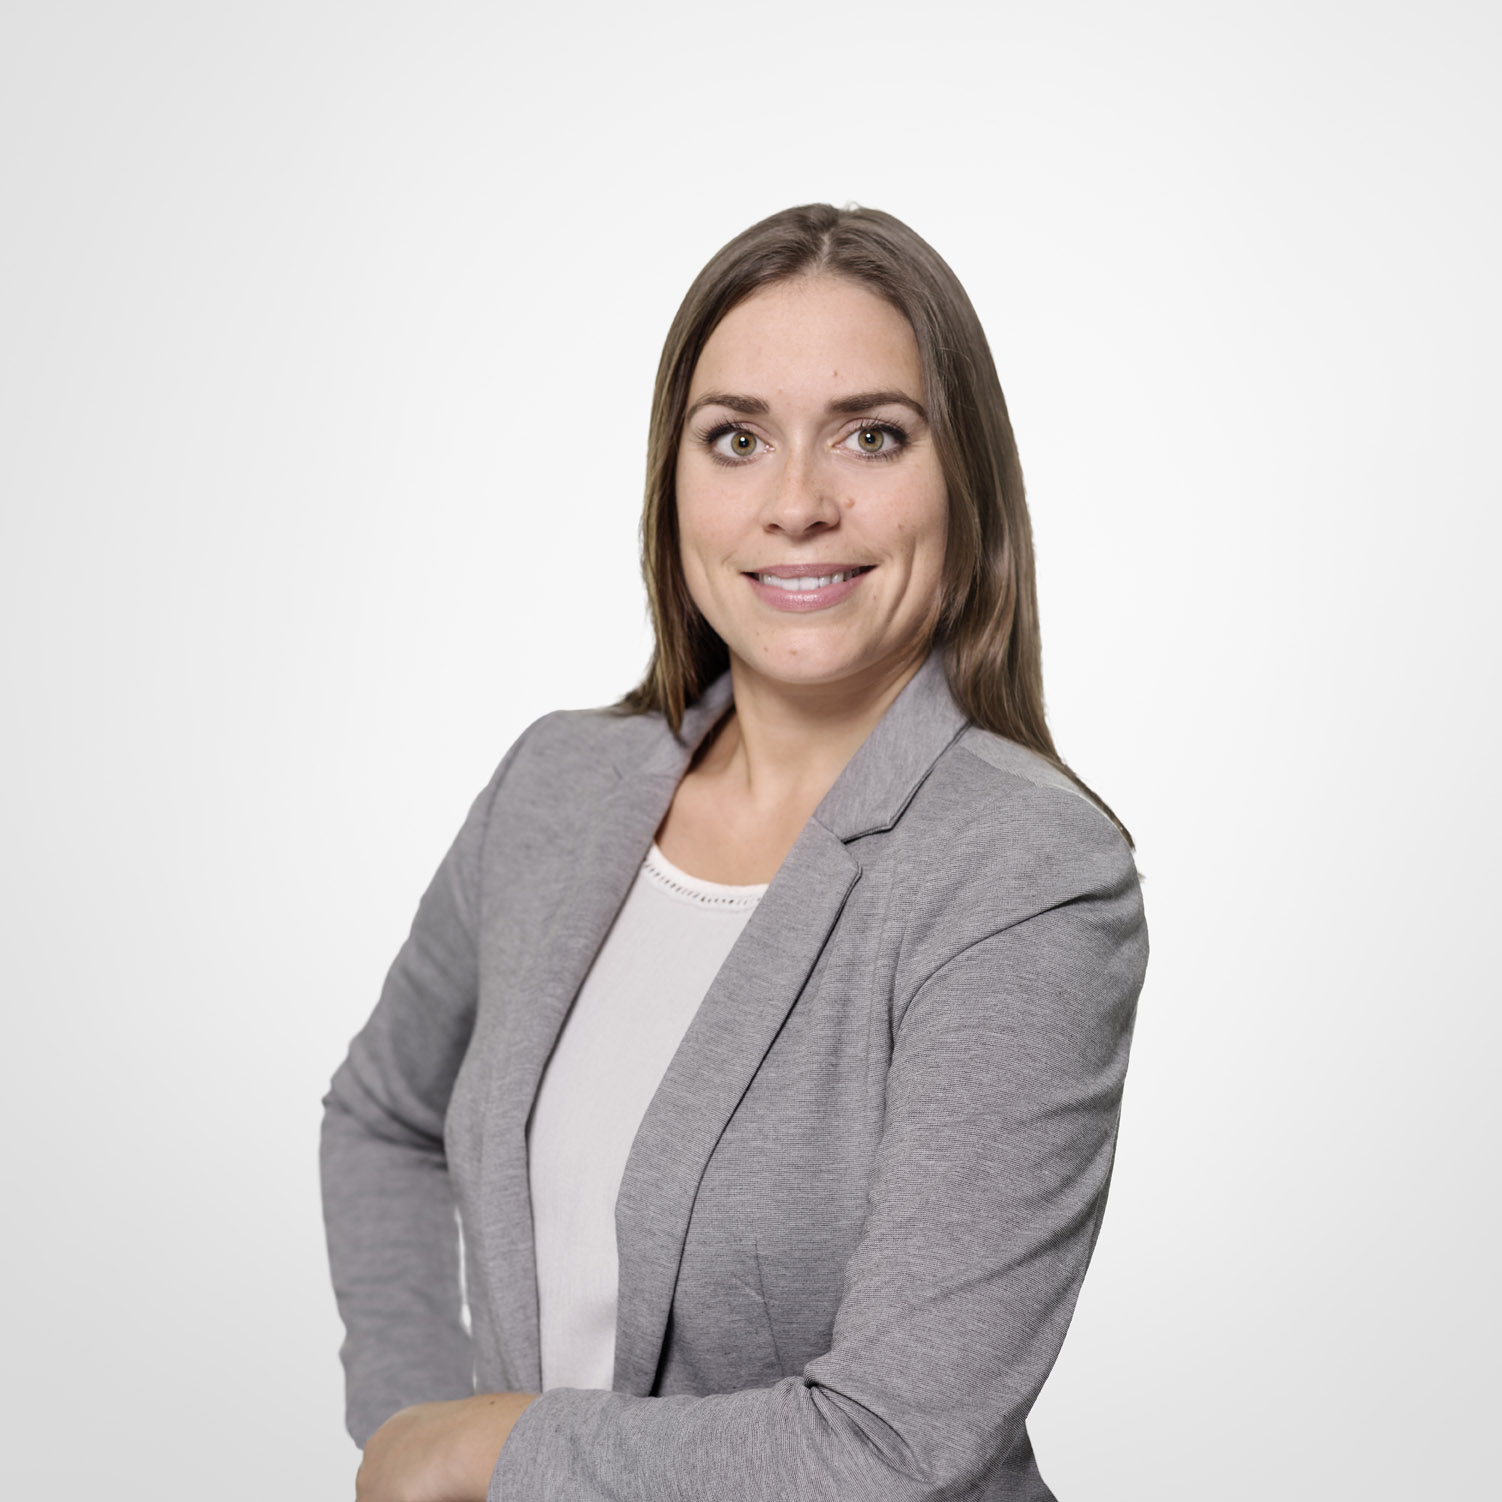 Anja Reutter